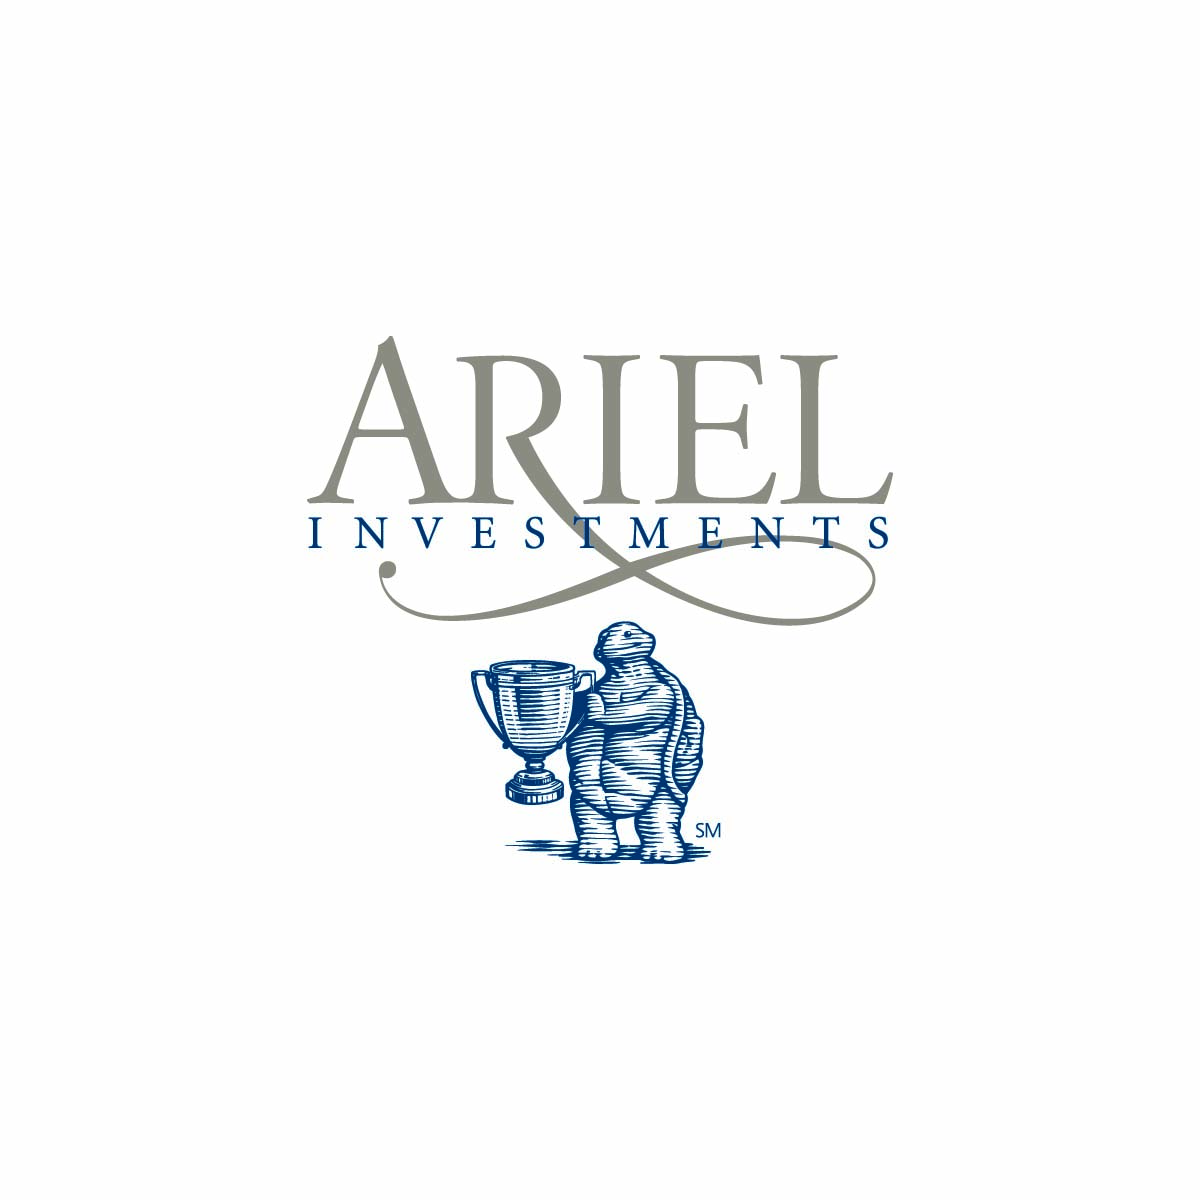 Ariel_colorlogo_standard.jpg